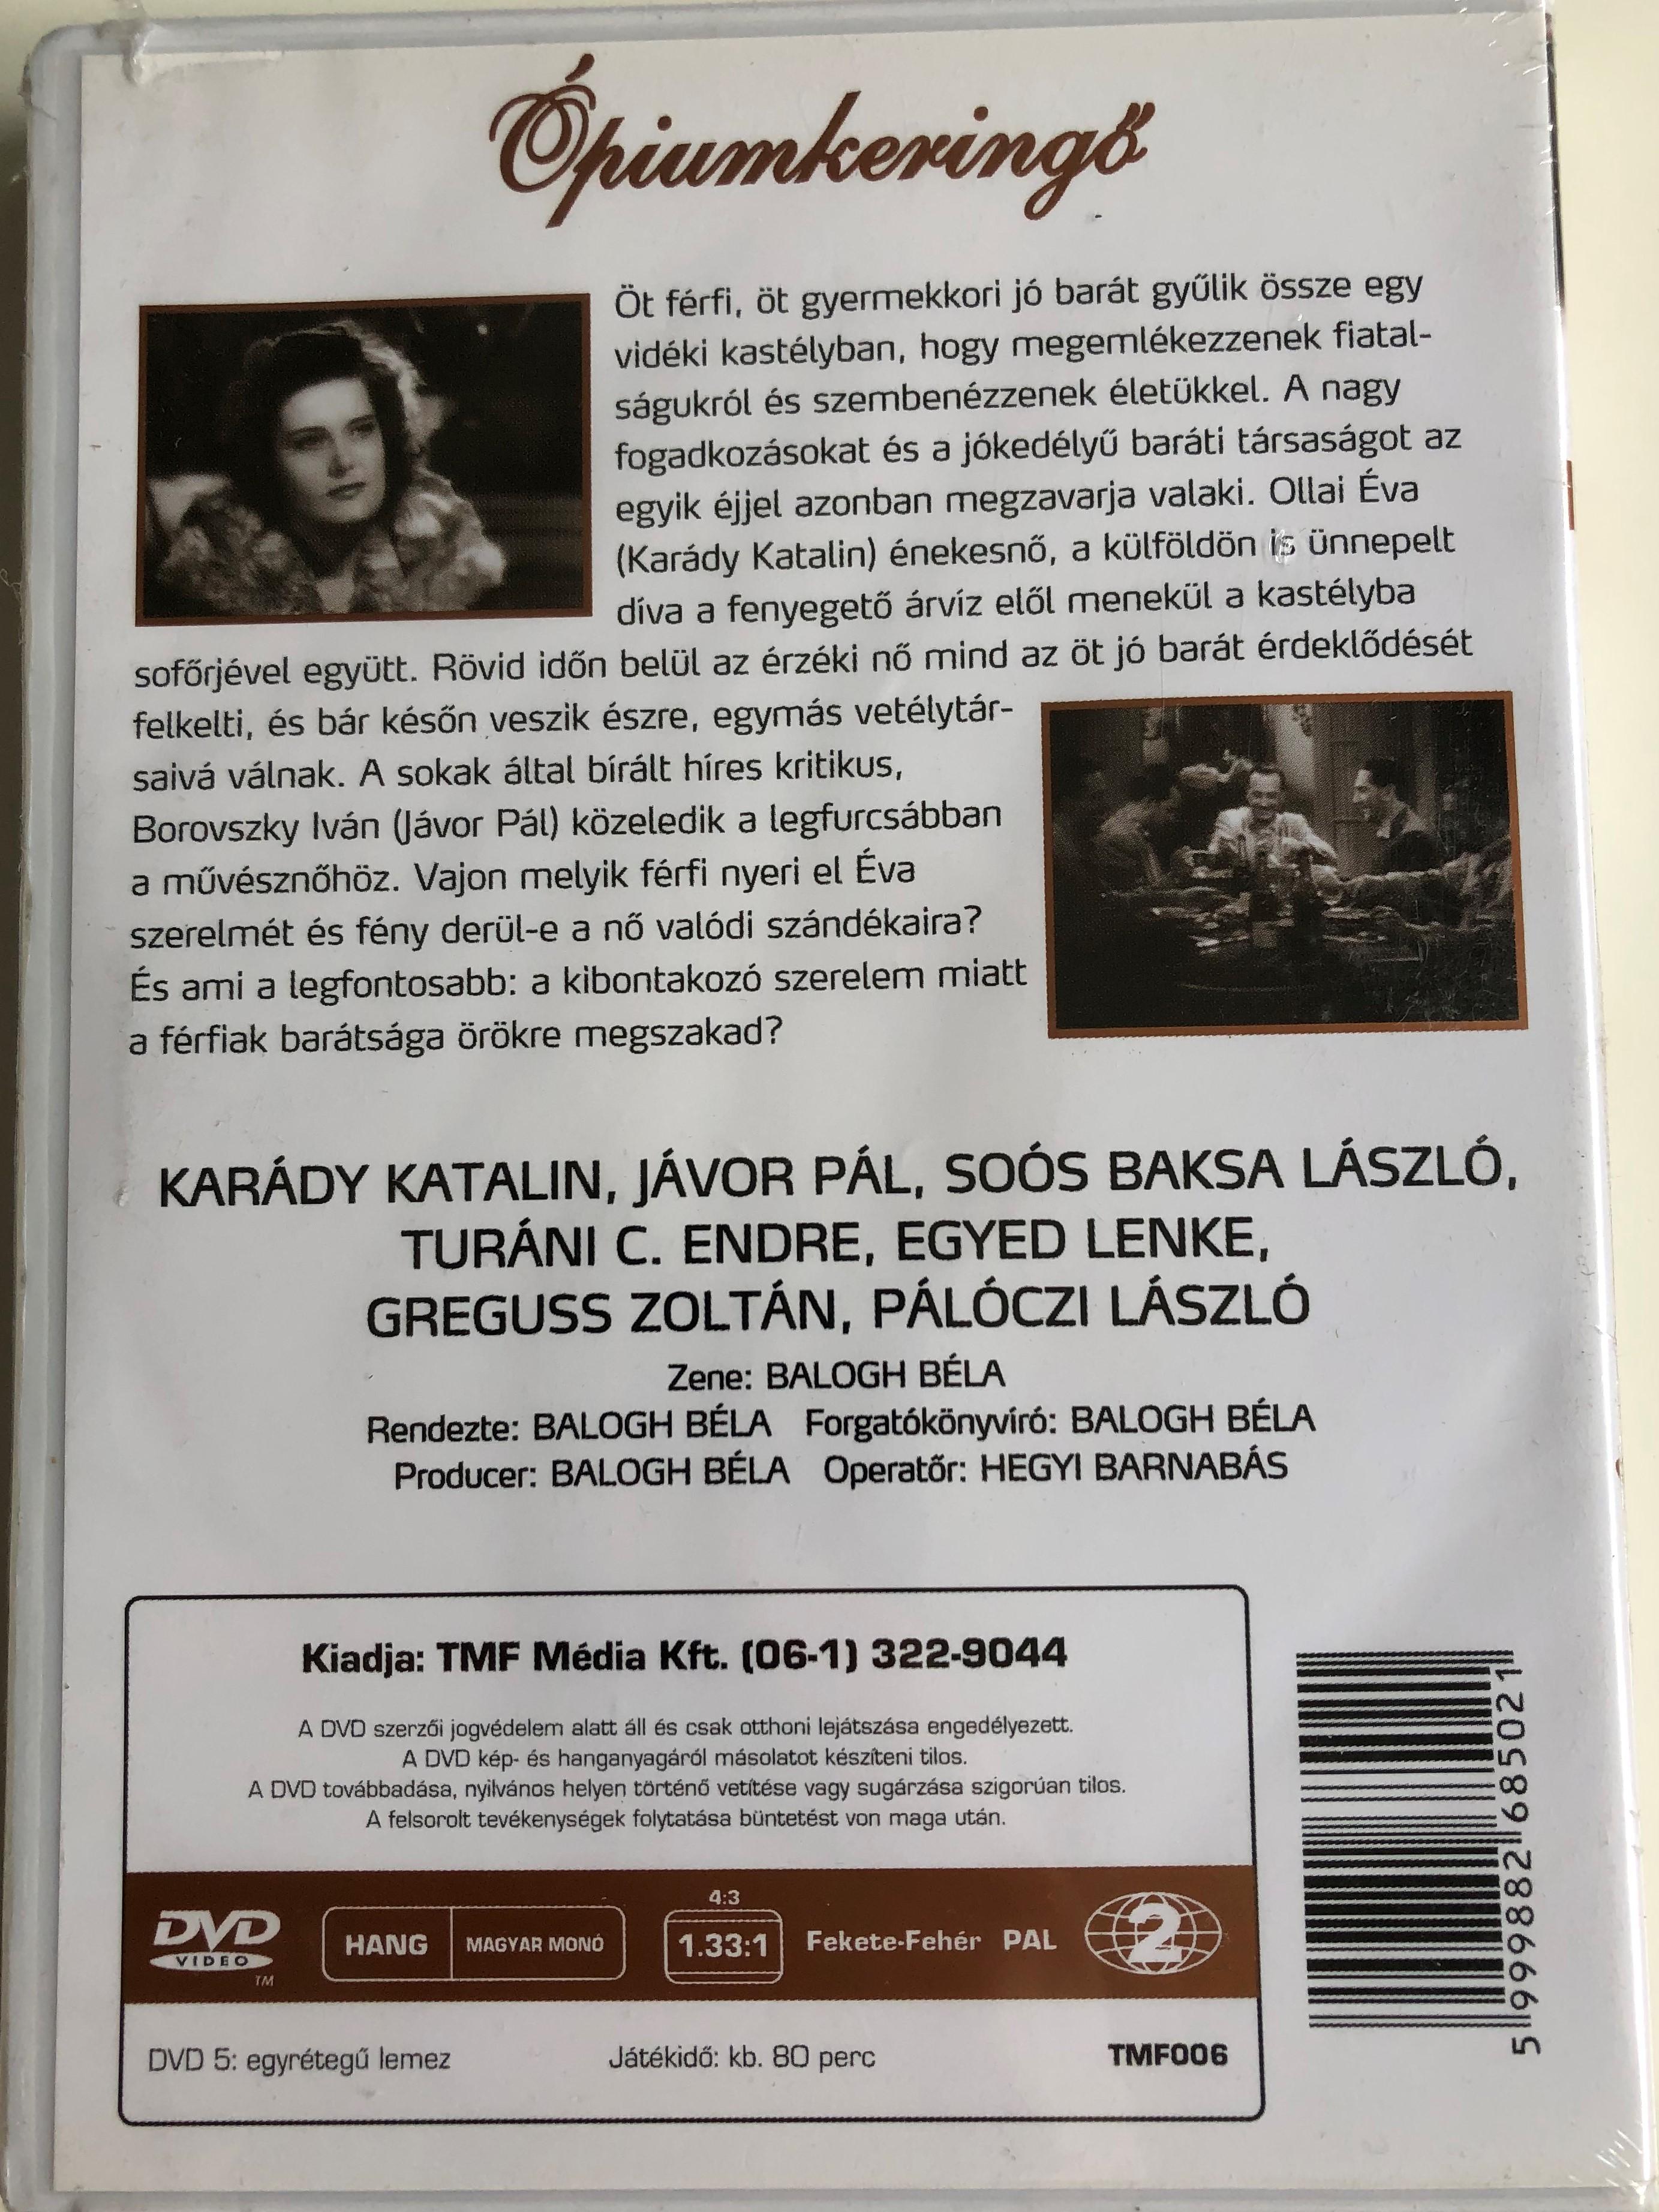 -piumkering-dvd-1943-opium-waltz-directed-by-balogh-b-la-starring-kar-dy-katalin-j-vorp-l-so-s-baksa-l-szl-tur-ni-c.-endre-r-gi-magyar-filmek-6-2-.jpg